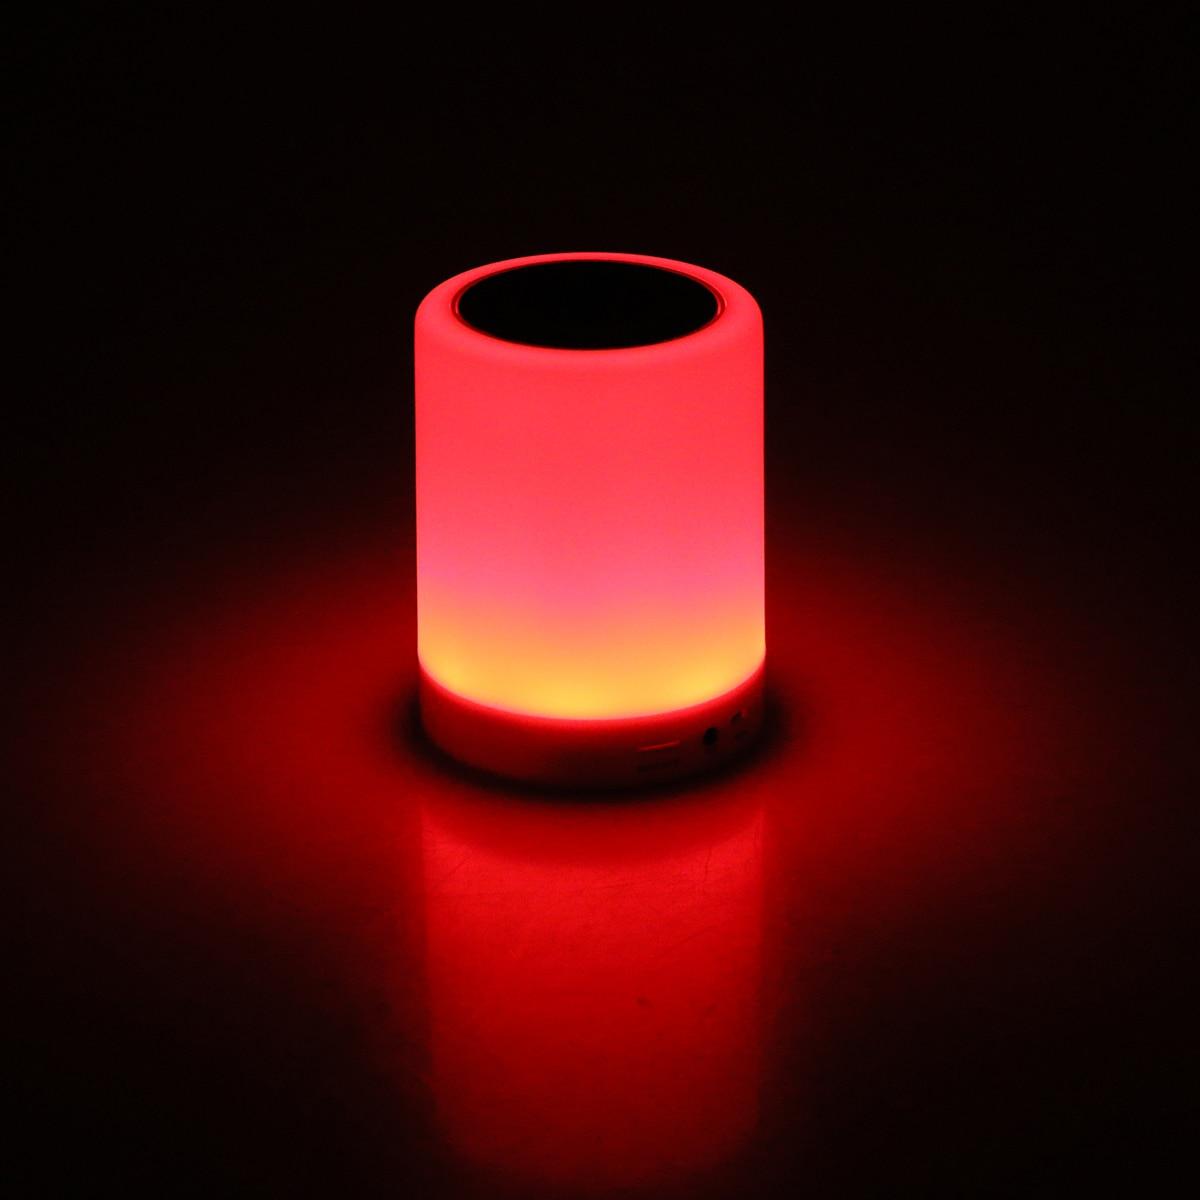 Led smart night lamp - Aliexpress Com Buy Smart Night Lamp Deep Stereo Bass Wireless Bluetooth Speaker Music Loudspeaker Colorful Led Light From Reliable Led Tape Light